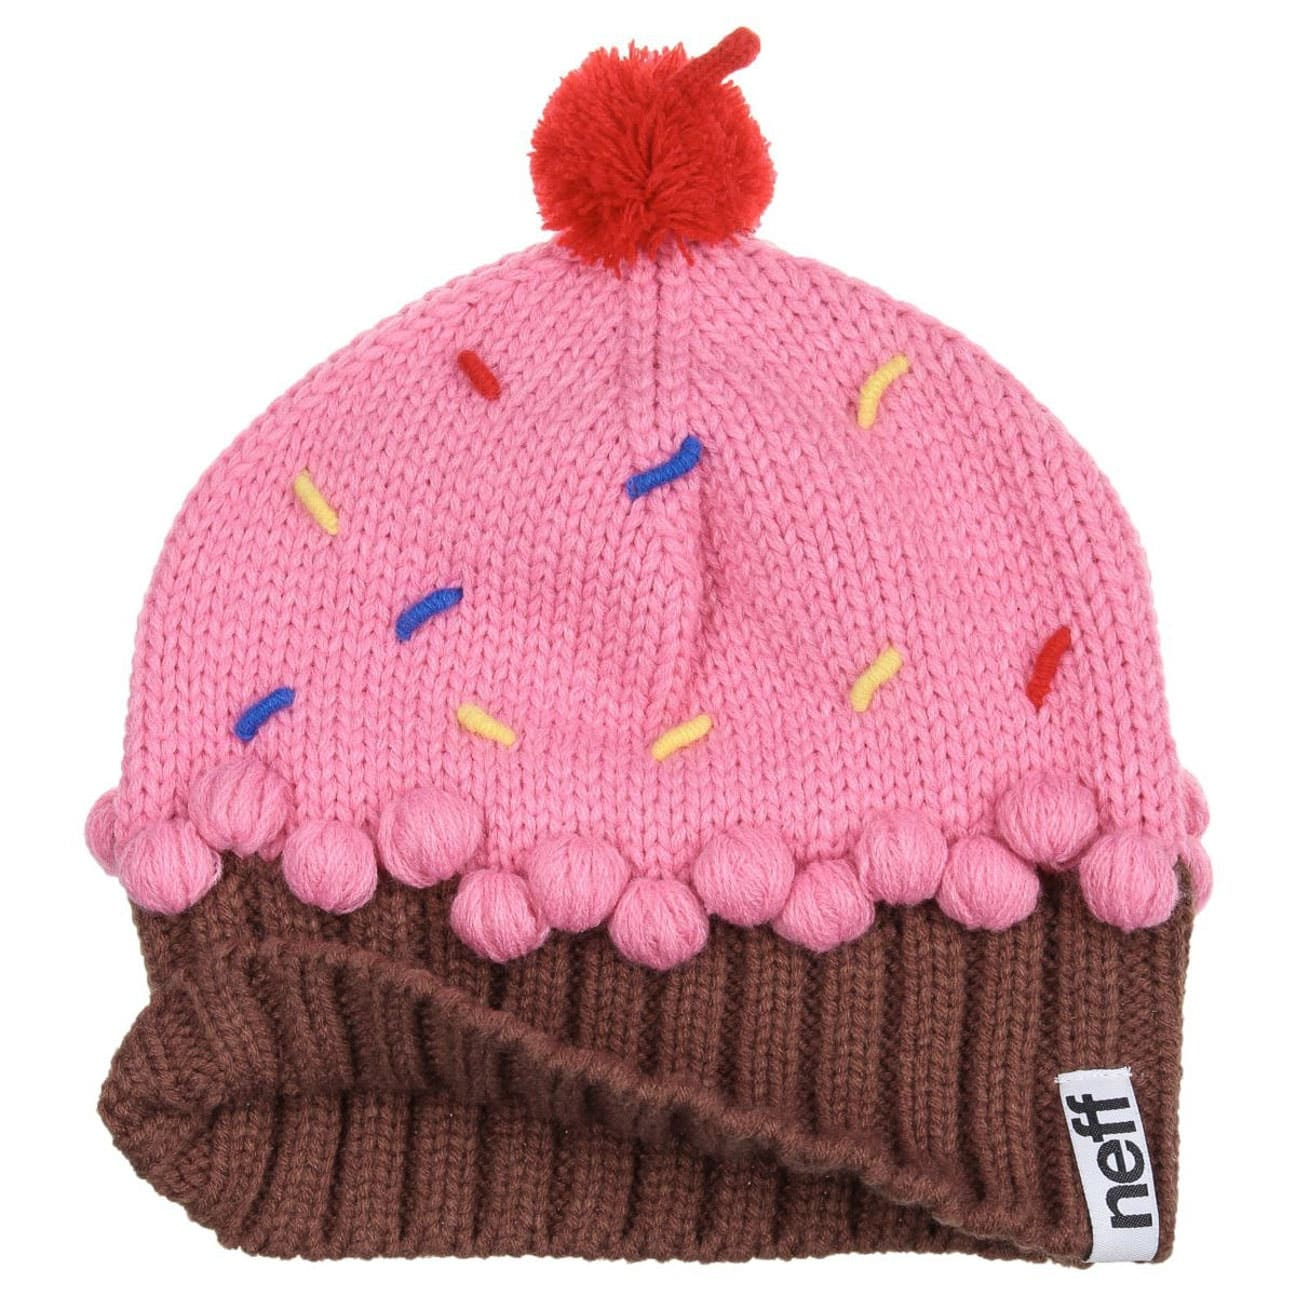 86111564b83 Cupcake Beanie by neff - rose 2 ...